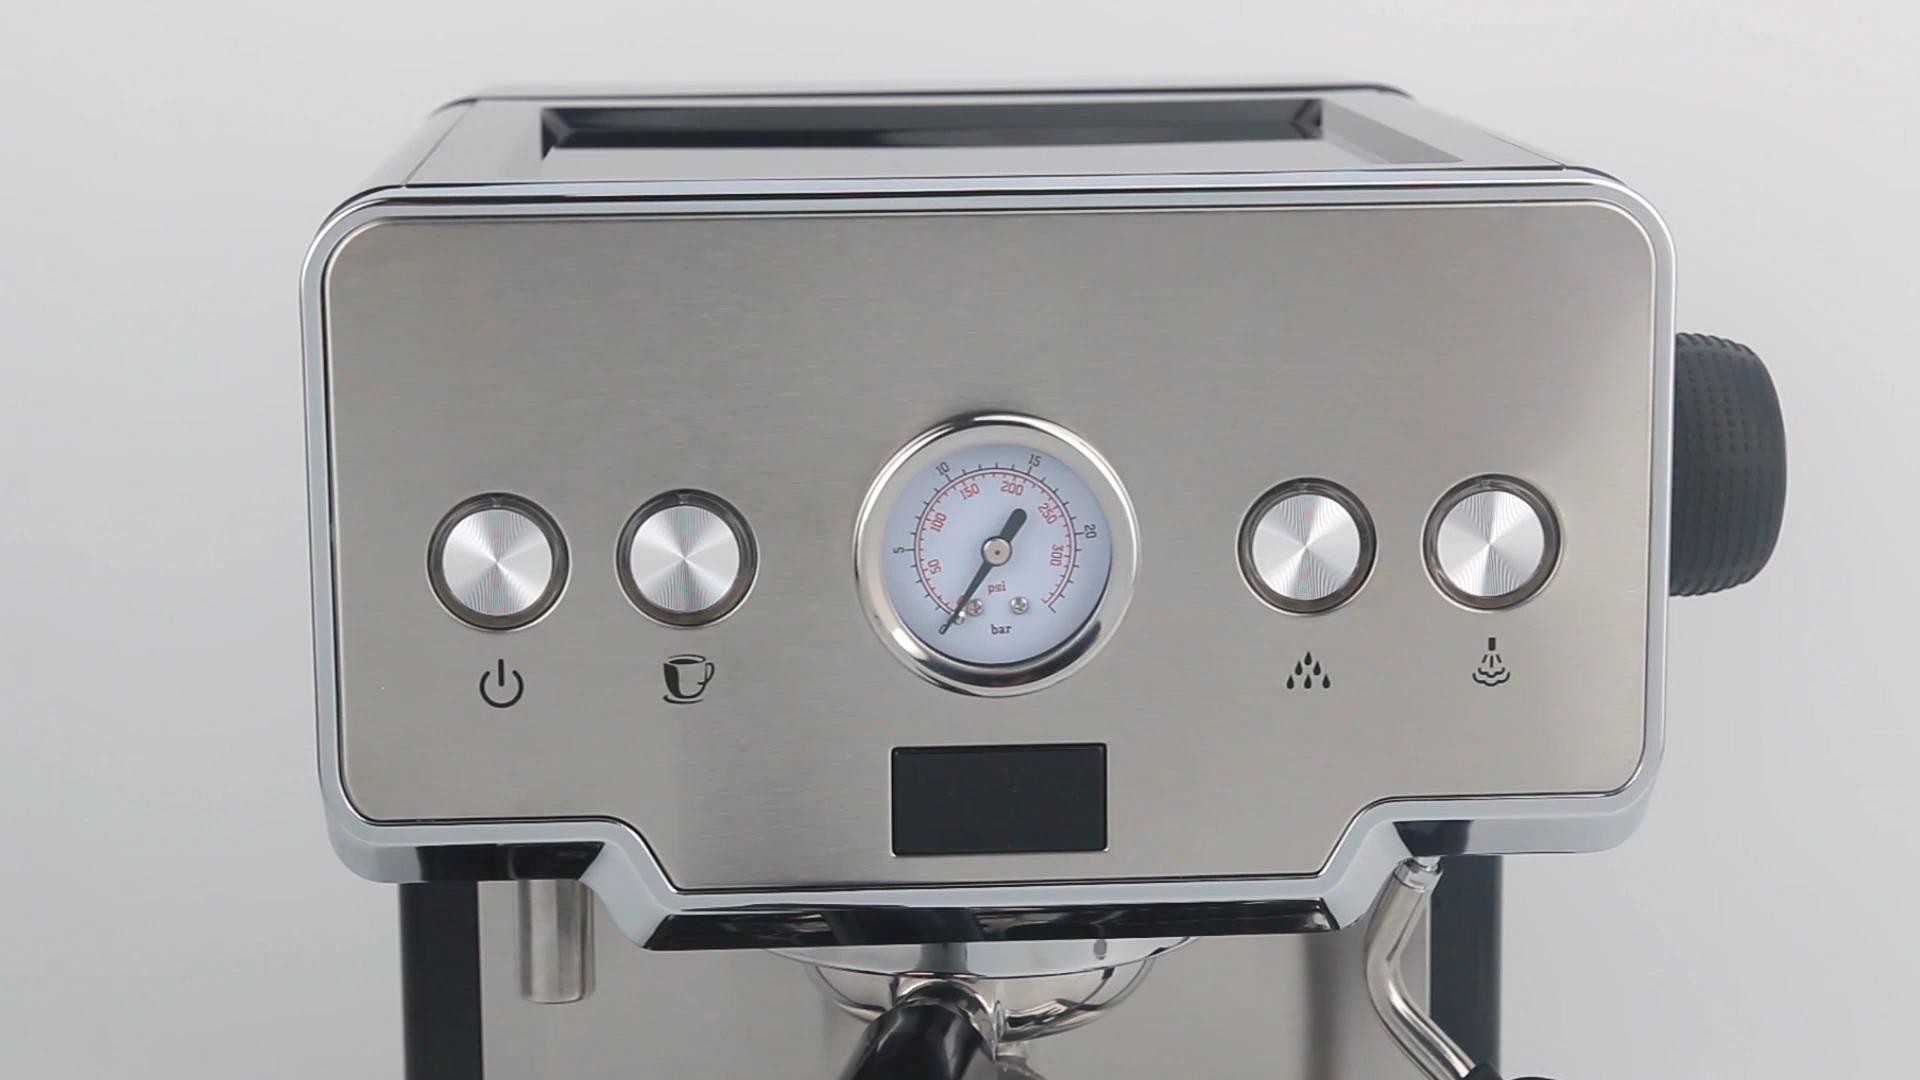 GZKITCHEN 15 Bar Bahasa Italia Semi Otomatis Mesin Pembuat Kopi Cappuccino Susu Bubble Maker Mesin Kopi Espresso untuk Rumah